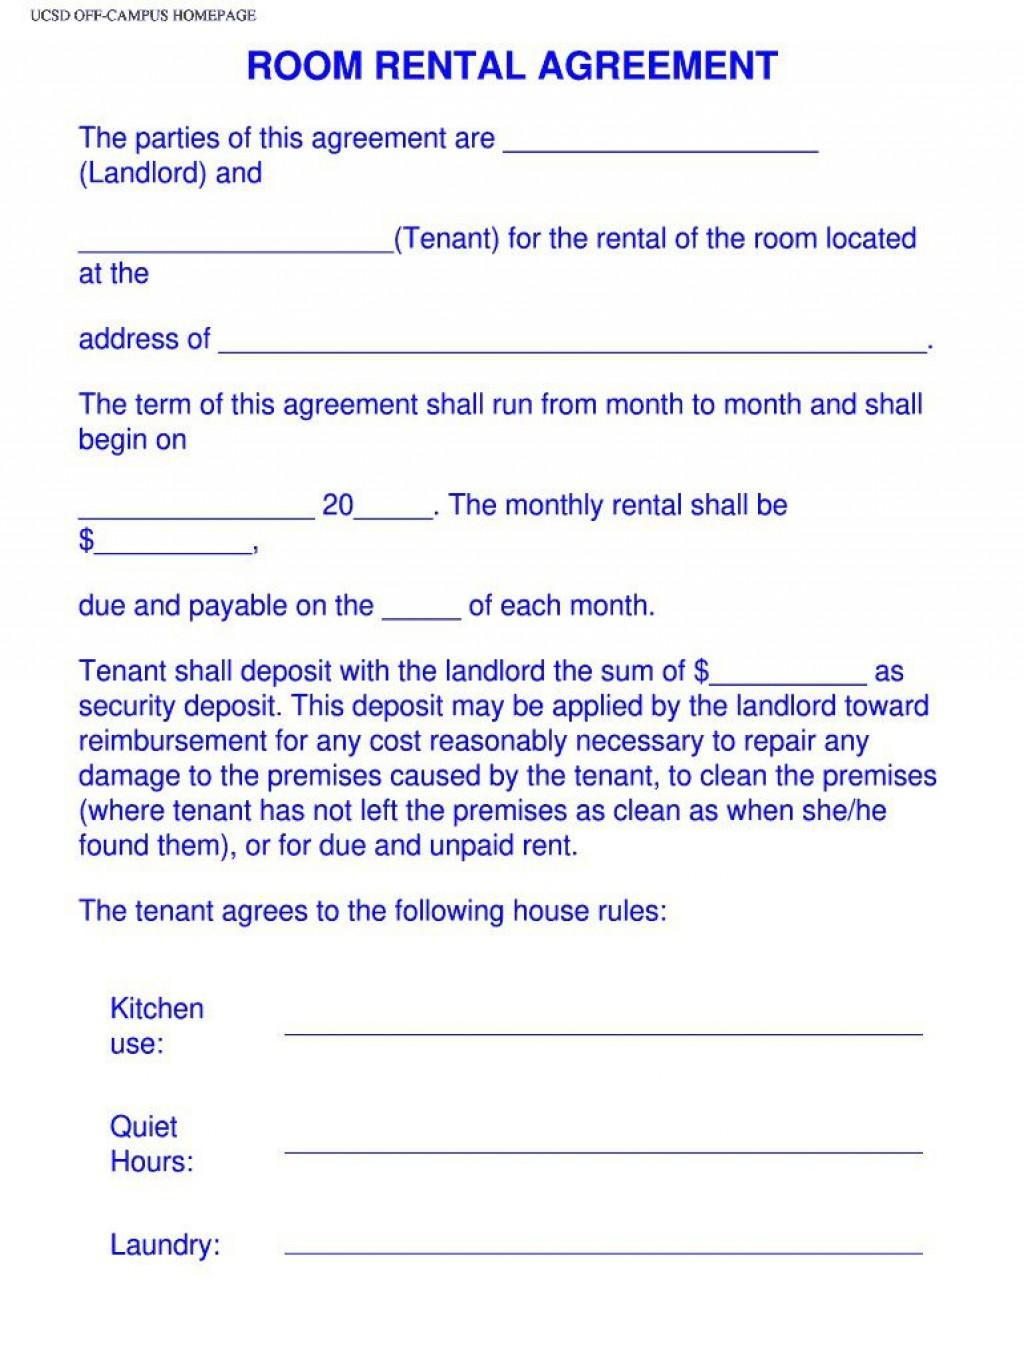 003 Magnificent Simple Room Rental Agreement Template Idea  FreeLarge